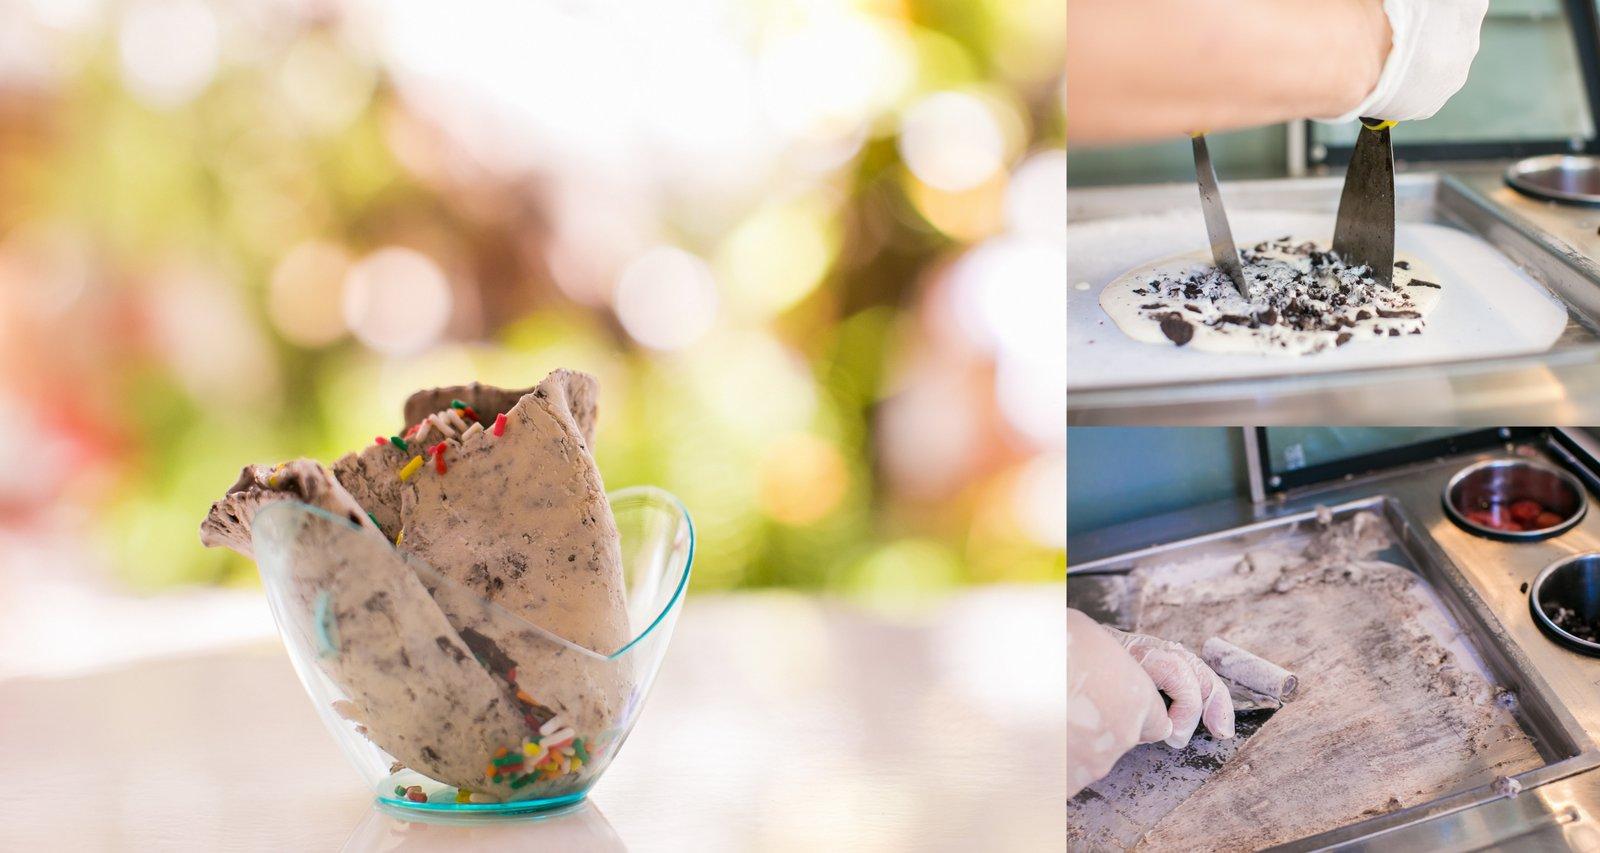 Nikki Beach: Rolled Ice Cream Every Sunday by Chef Frank Ferreiro